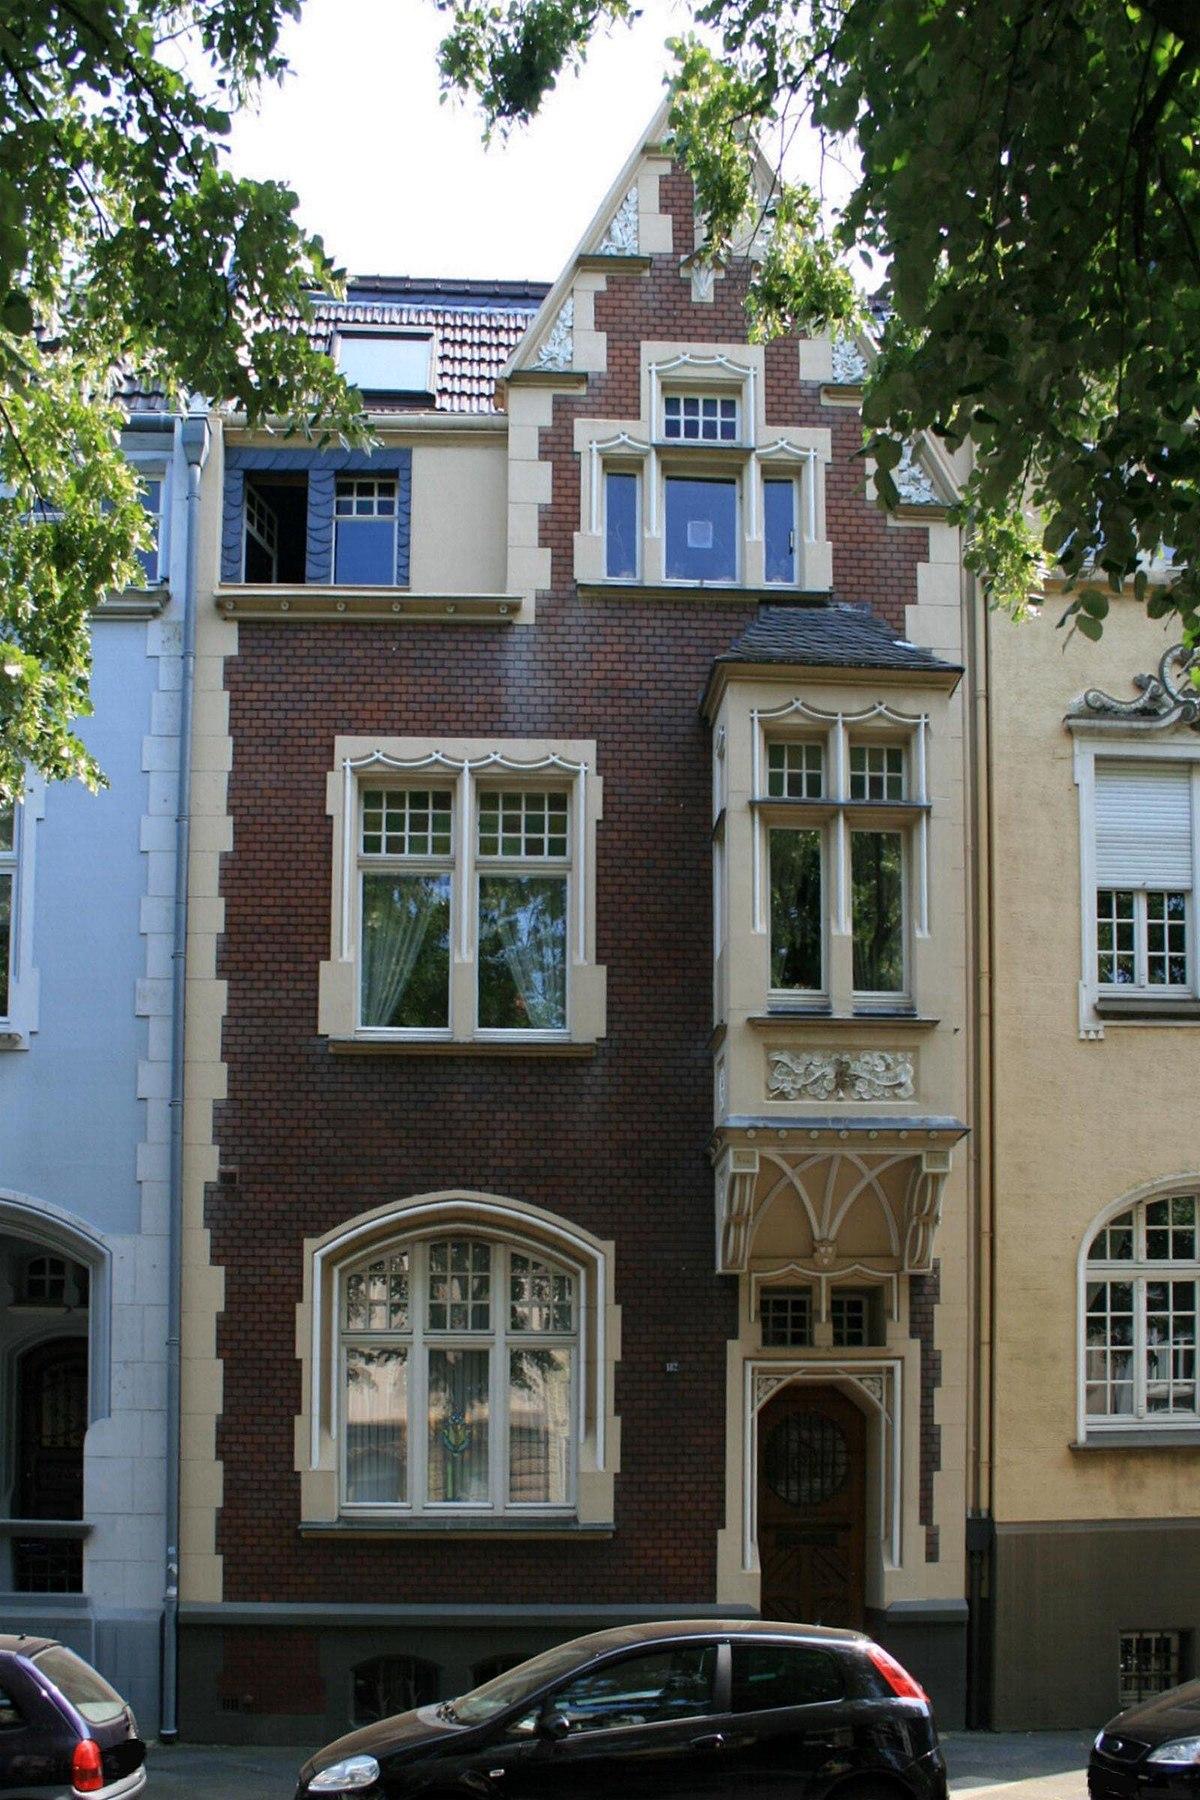 Fenster M Nchengladbach brucknerallee 182 mönchengladbach